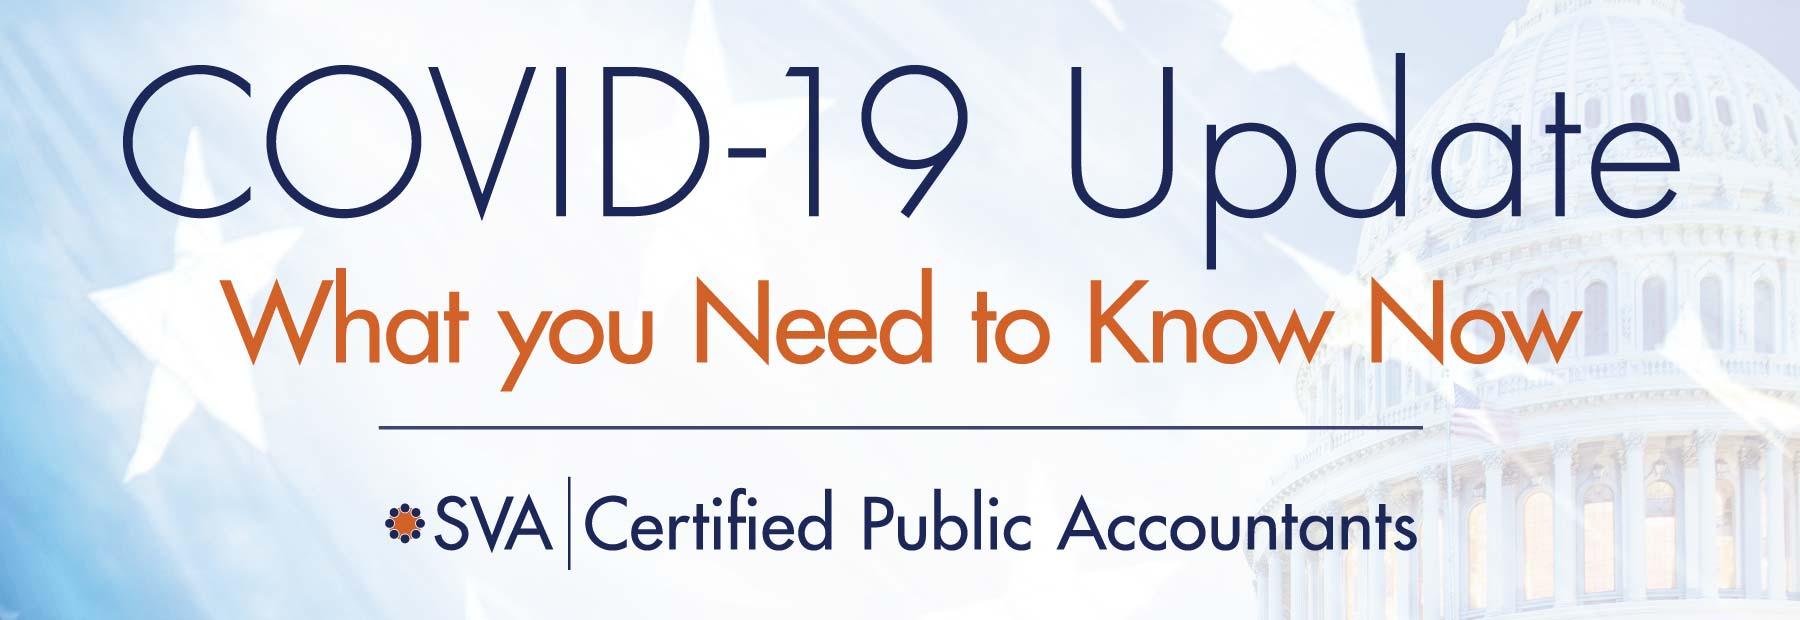 sva-certified-public-accountants-covid-19-update-header